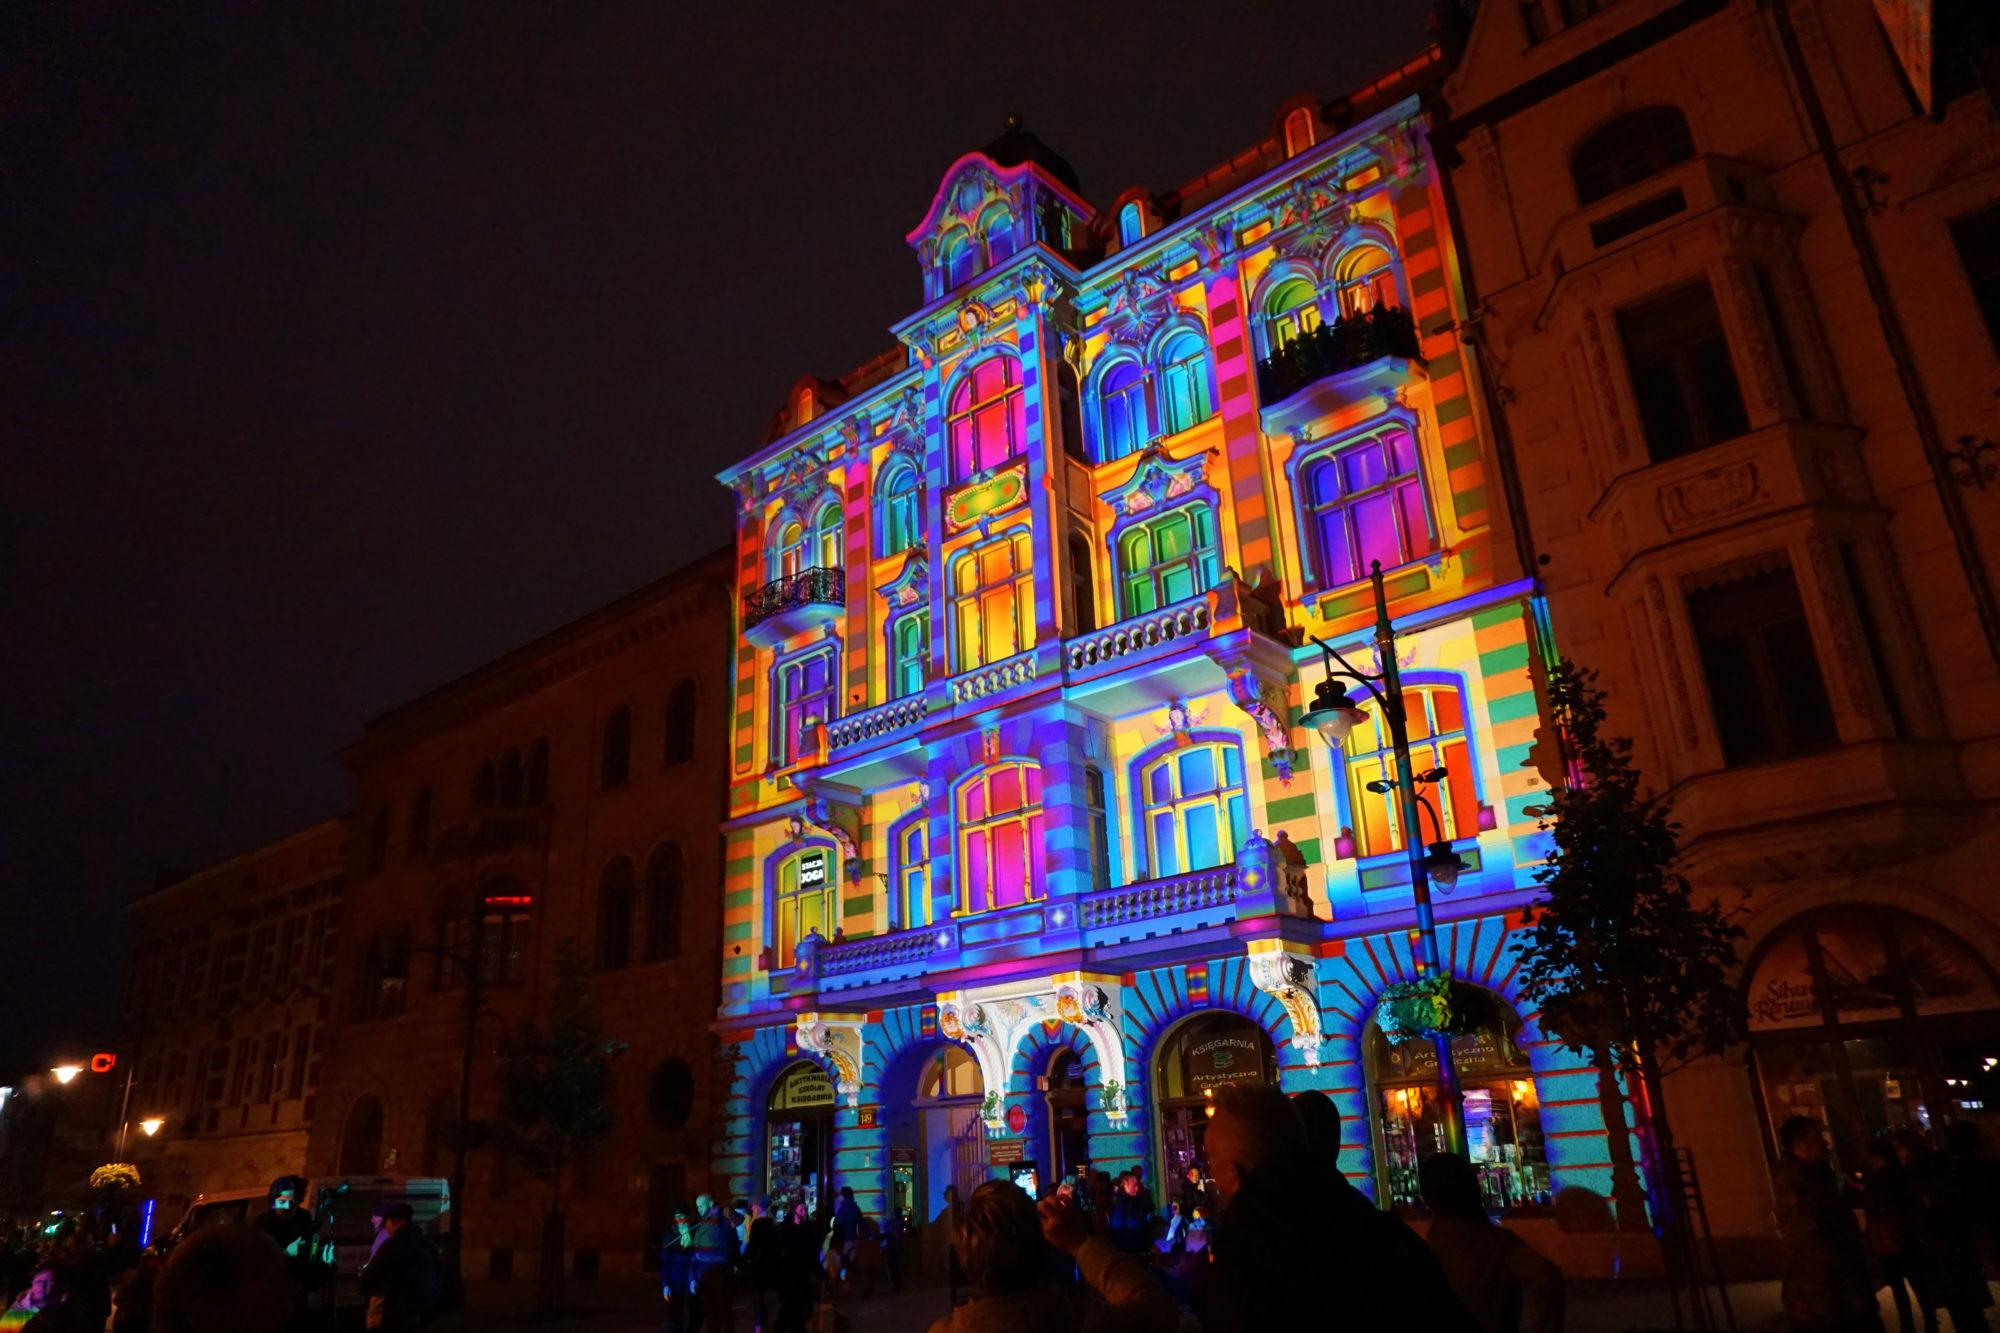 Festiwal Światła Łódź 01